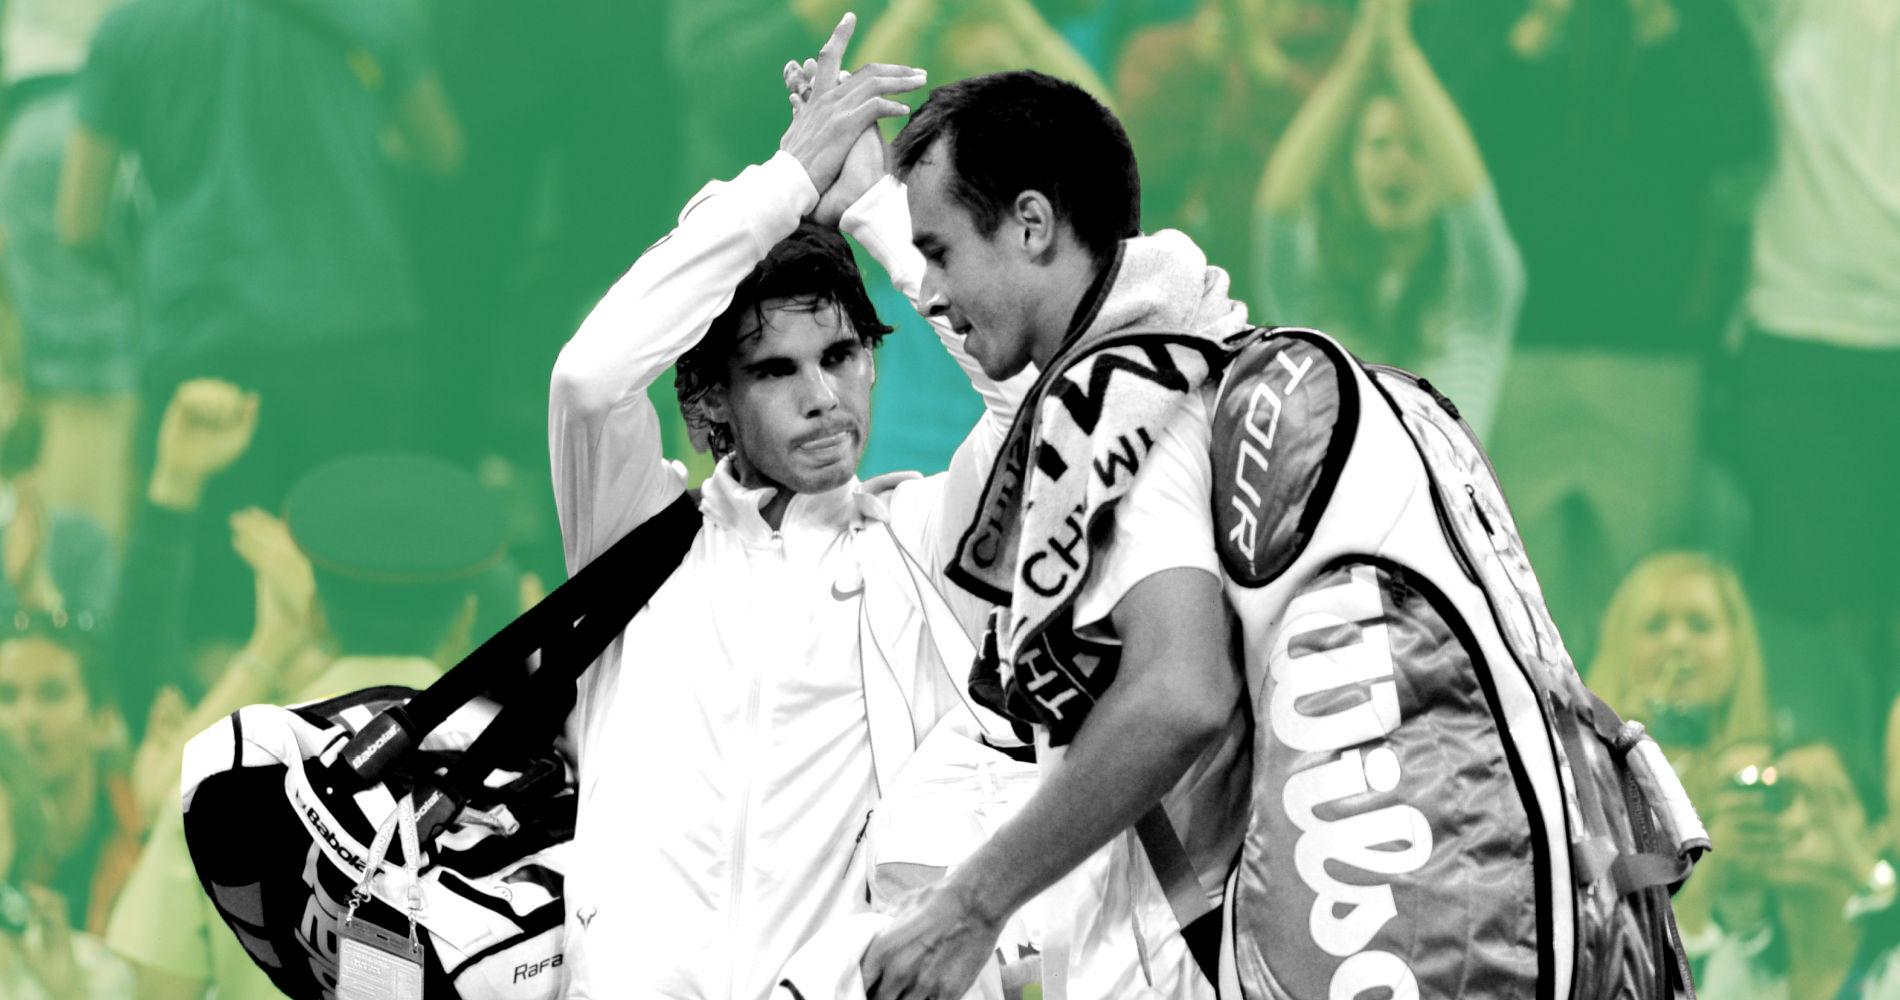 Rafael Nadal & Lukas Rosol at Wimbledon in 2012